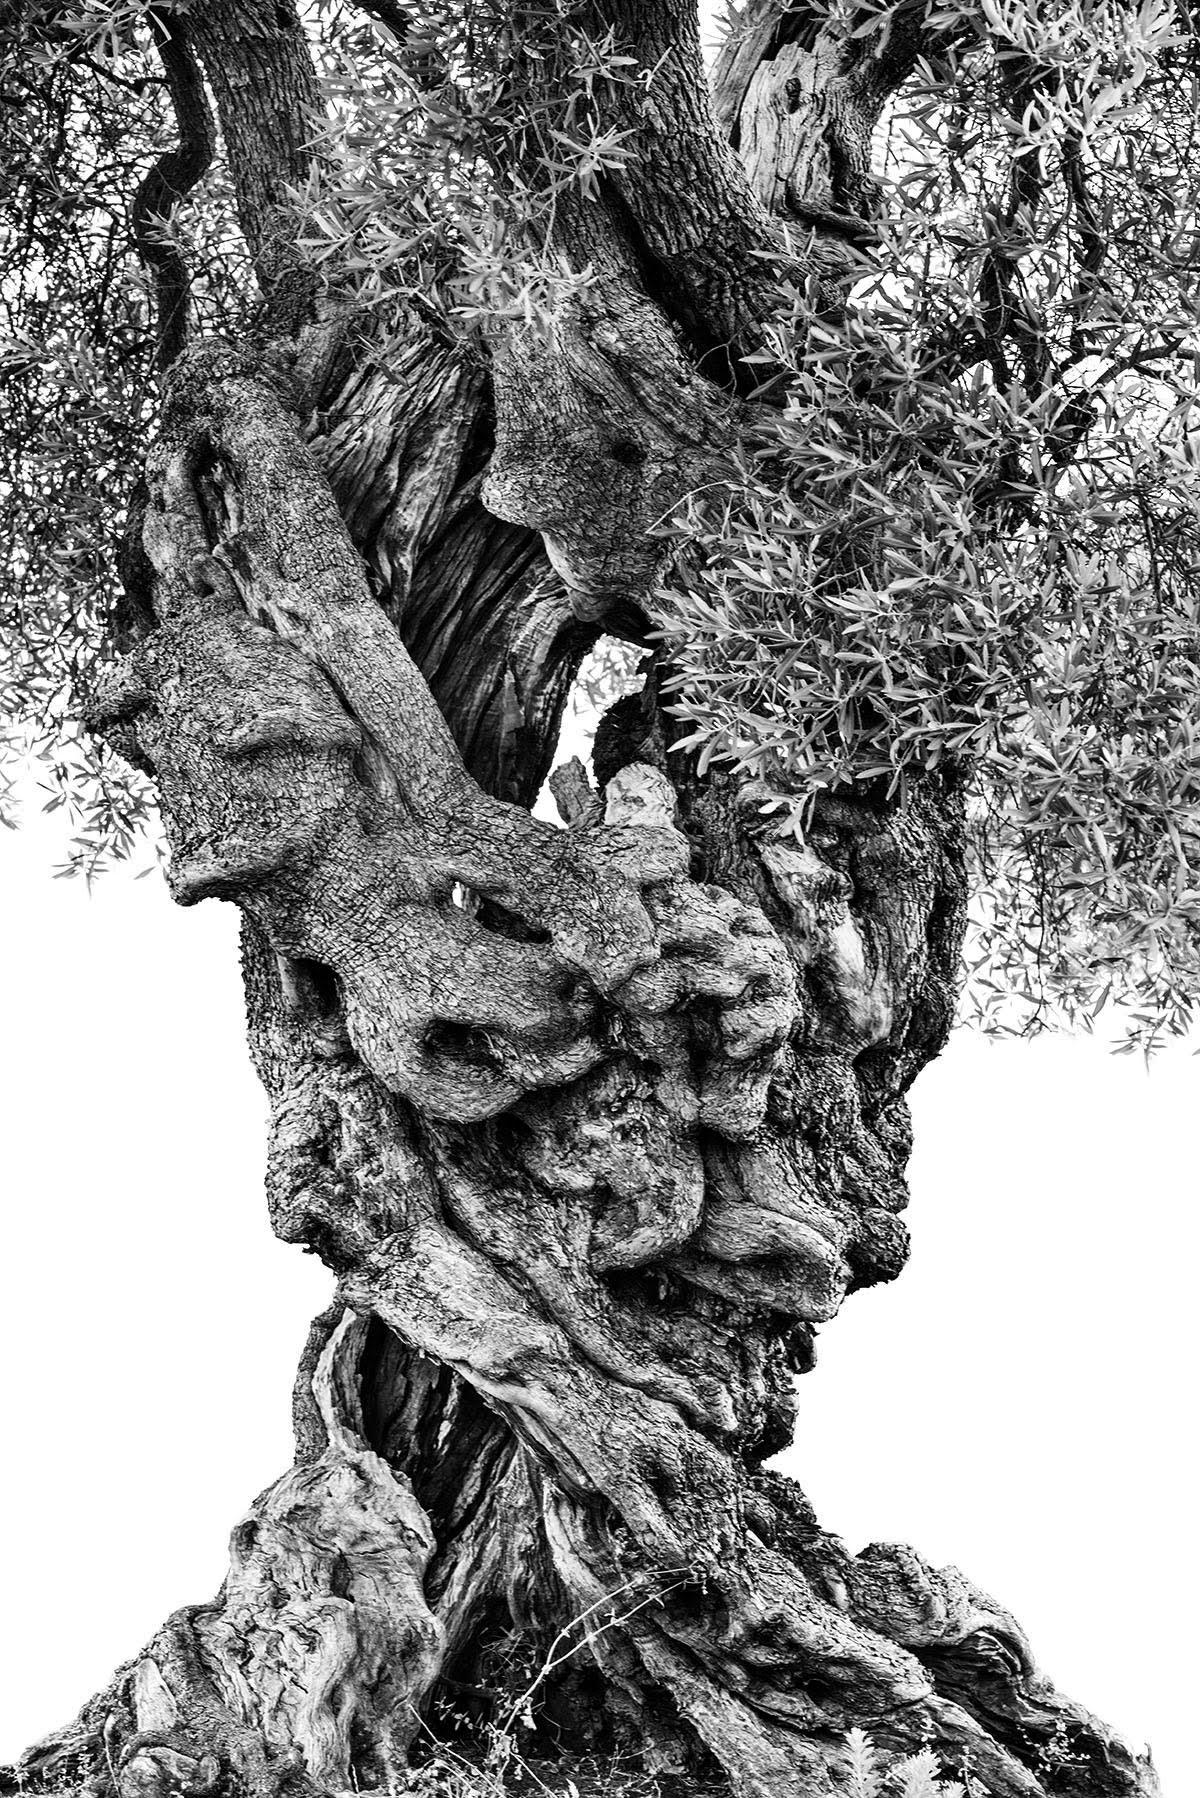 martin-ogolter-Monumentali-nature-landscape-photographer-19